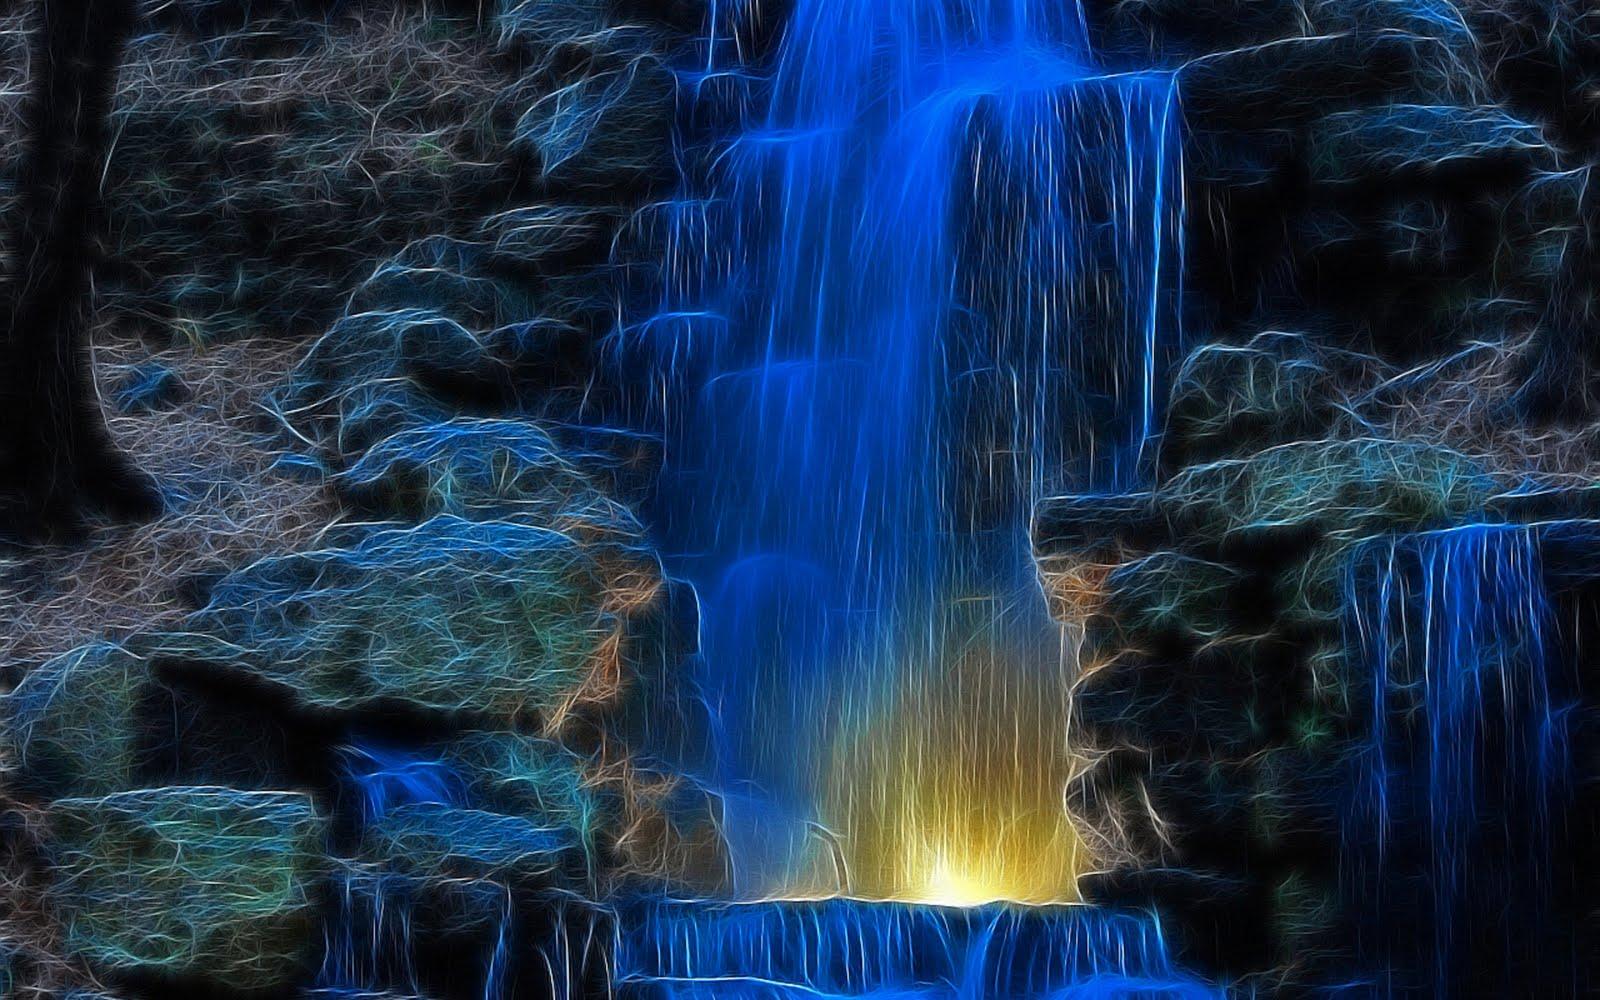 waterfall scenery wallpaper